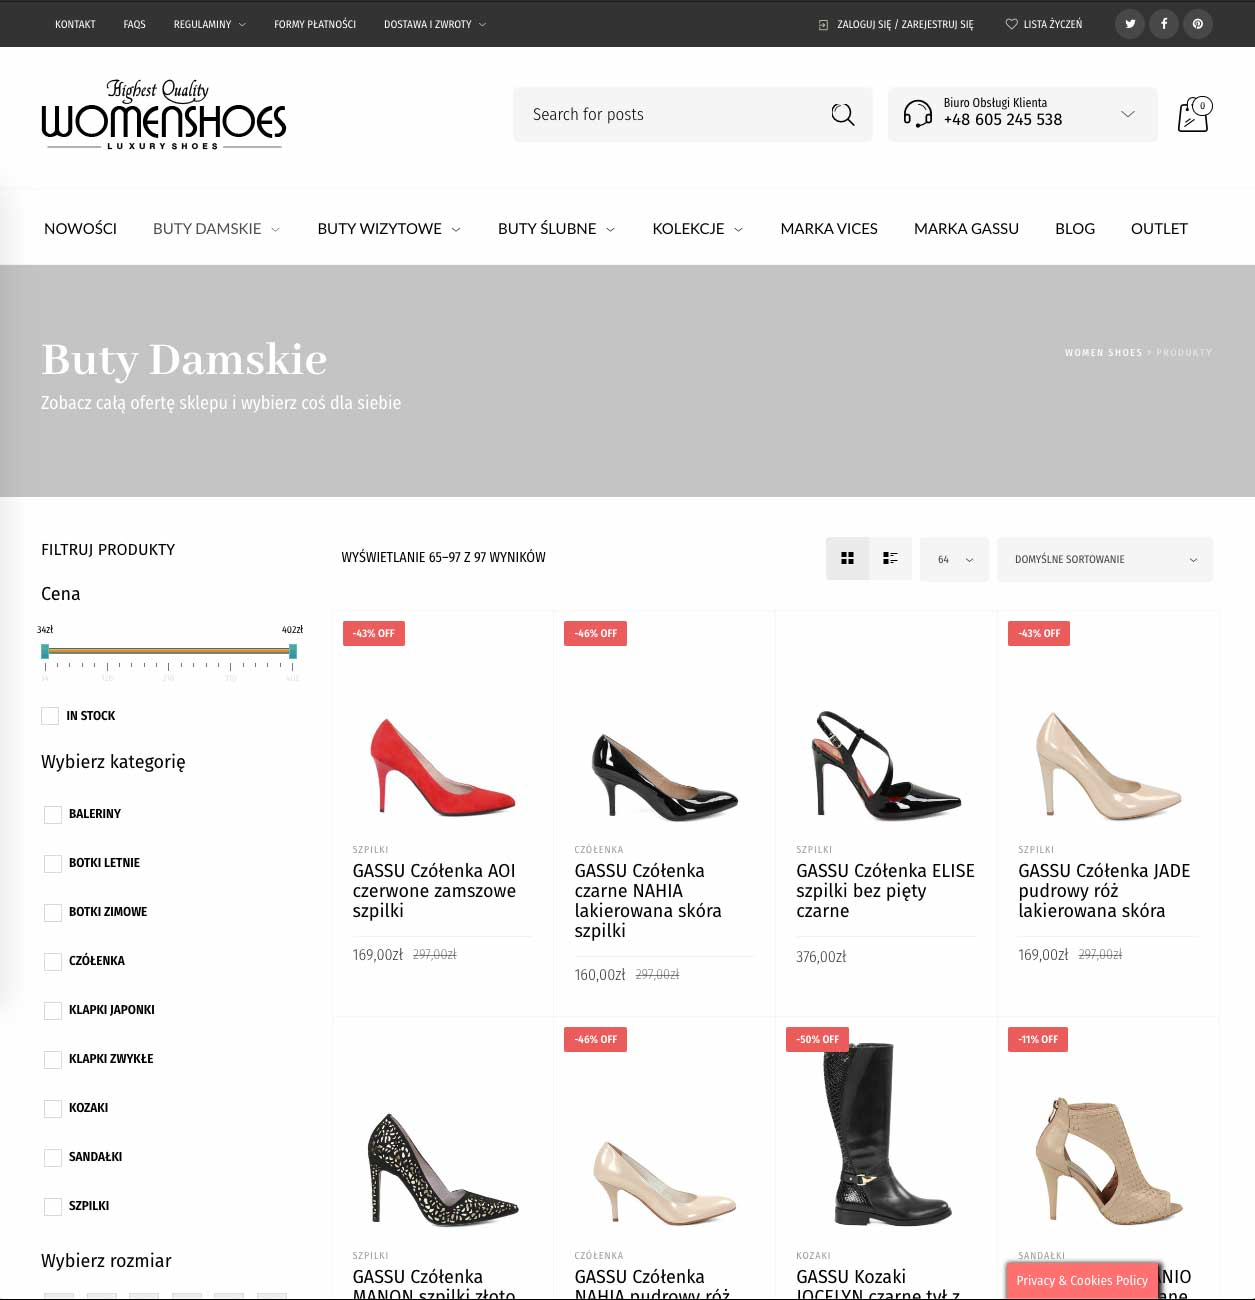 Realizacja WomenShoes 7